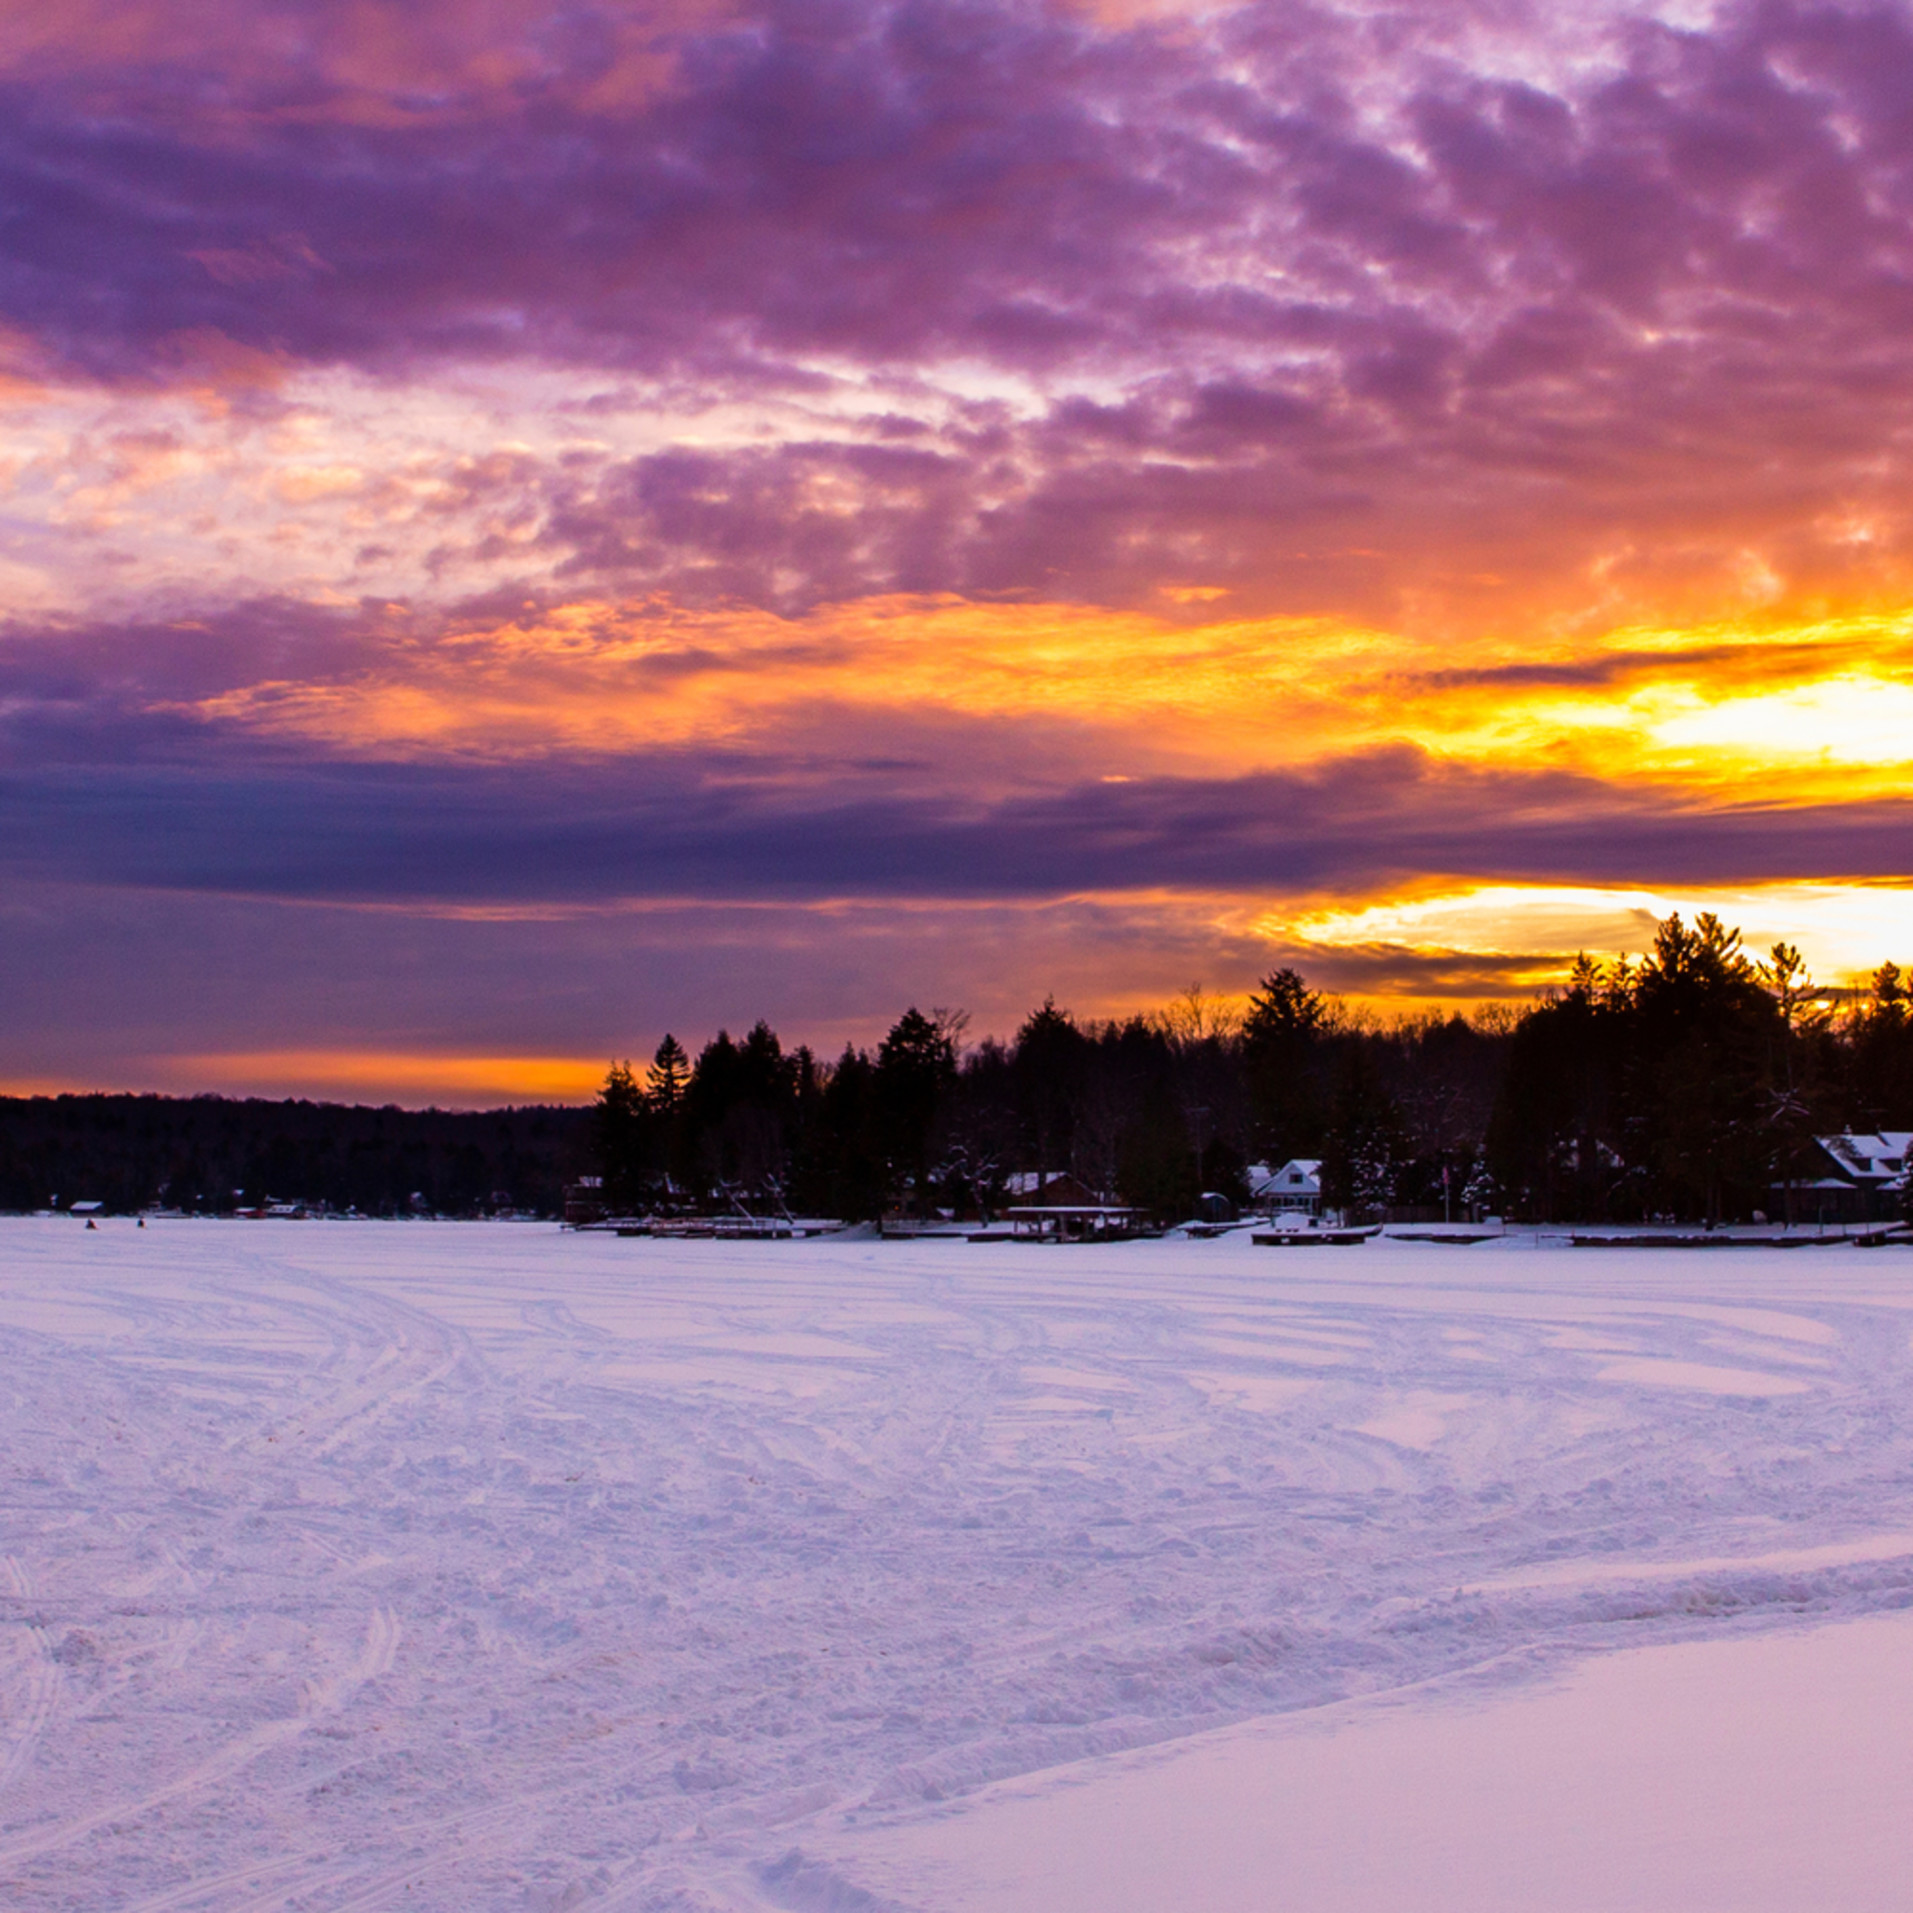 4th lake snowmobile sunset panormic dkke9b